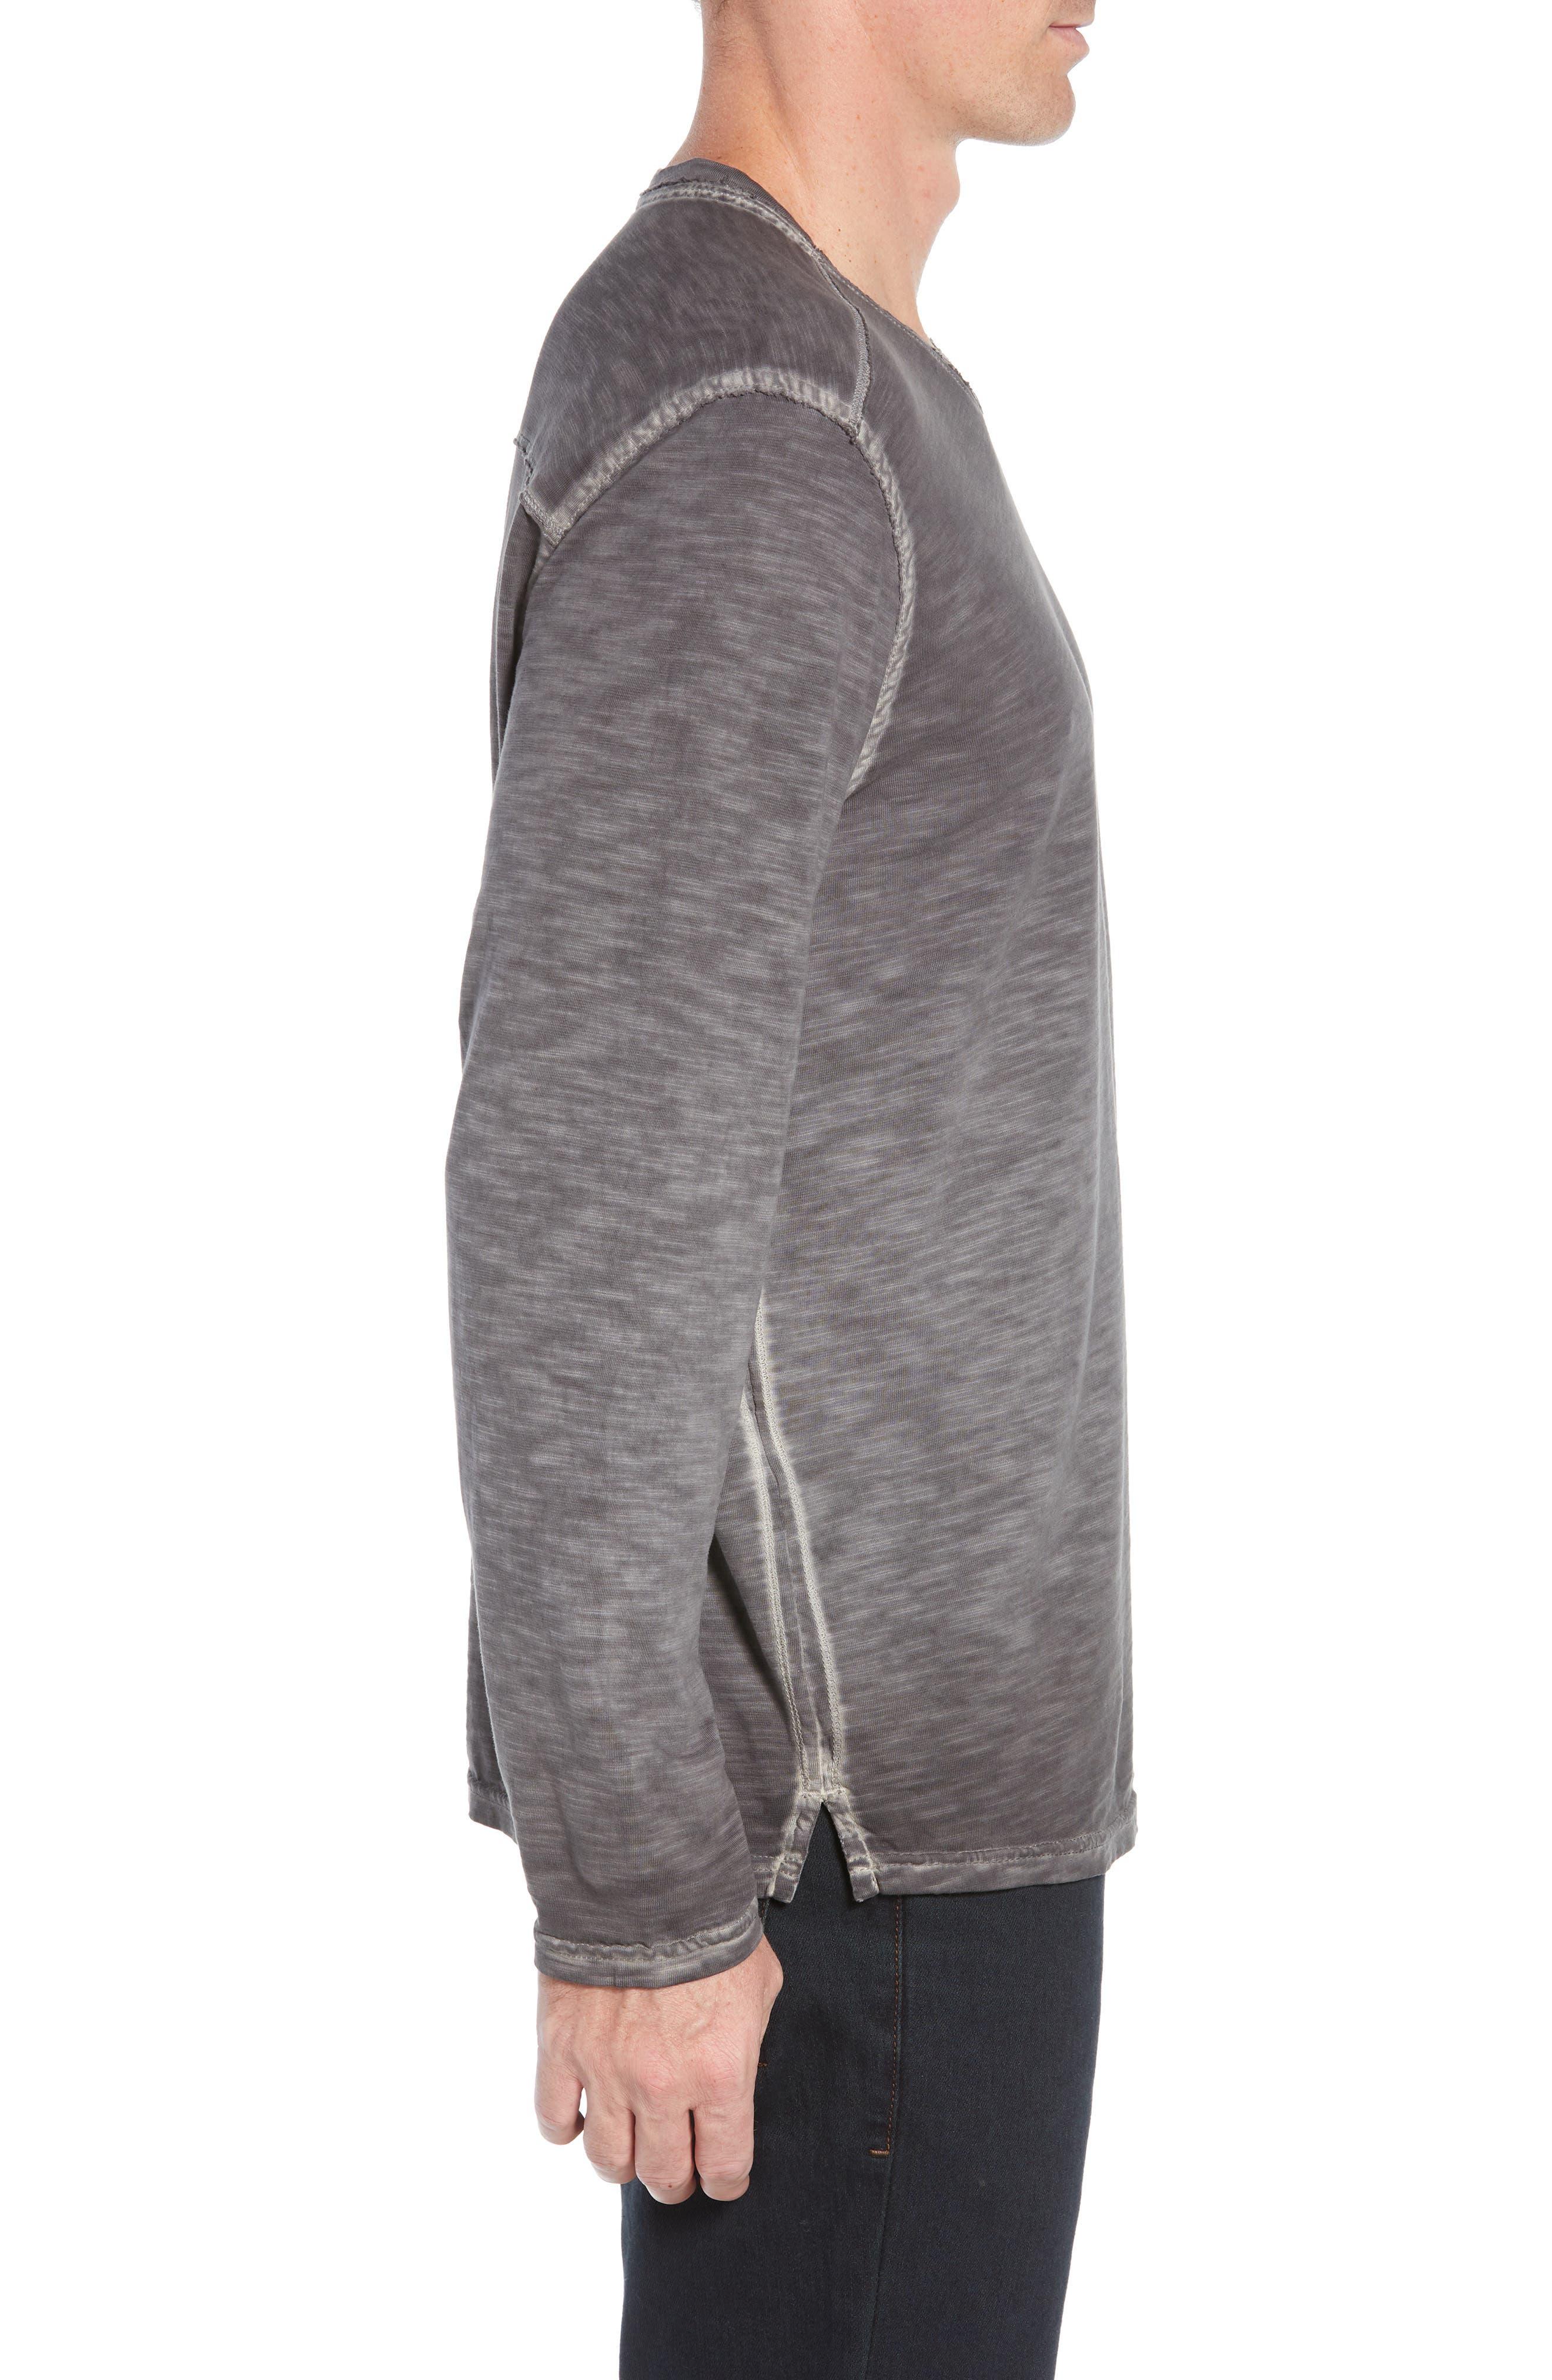 Suncoast Shores Long Sleeve V-Neck T-Shirt,                             Alternate thumbnail 3, color,                             COAL